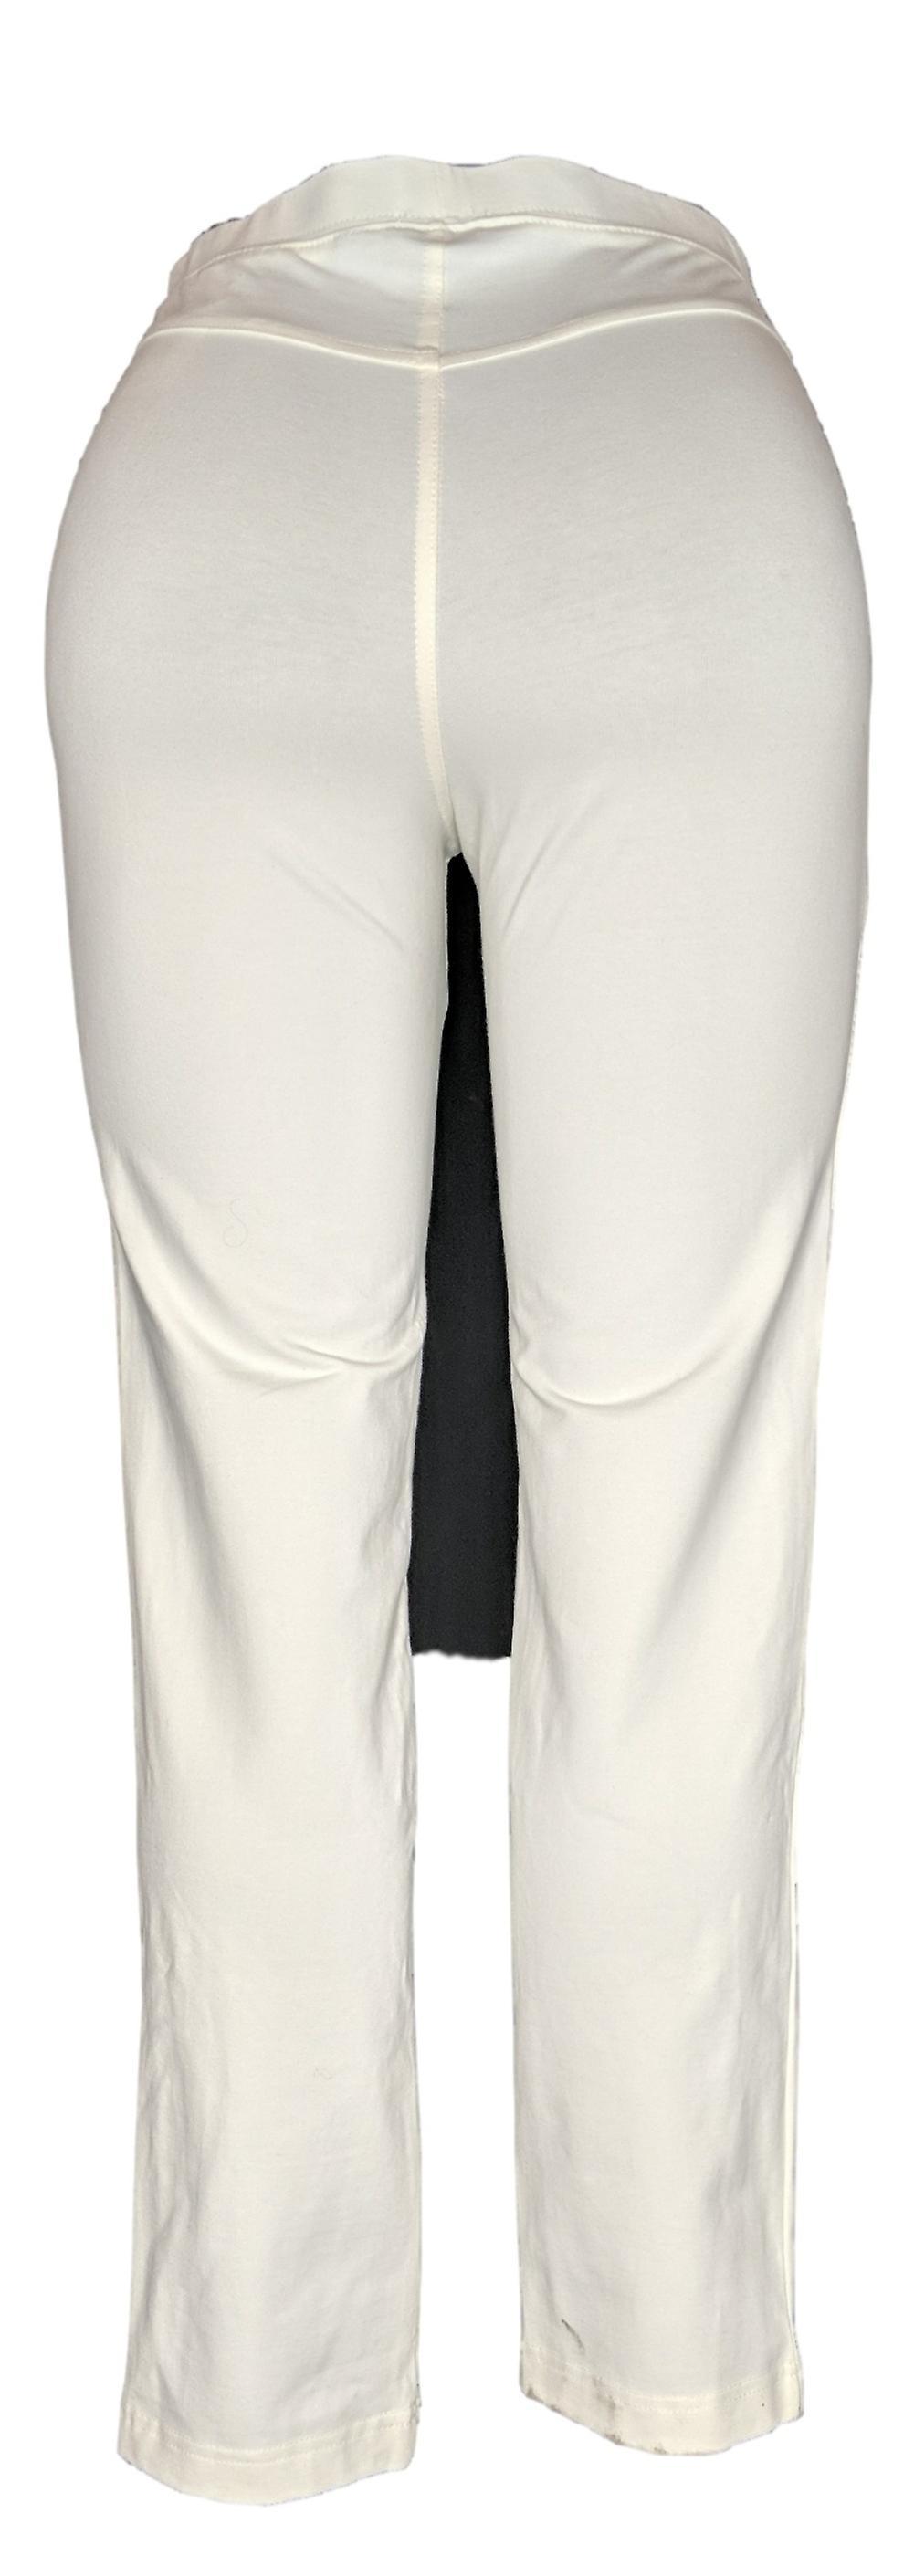 Women with Control Women's Pants Regular Pull-On Slim Leg Ivory A310159 TPGkJv